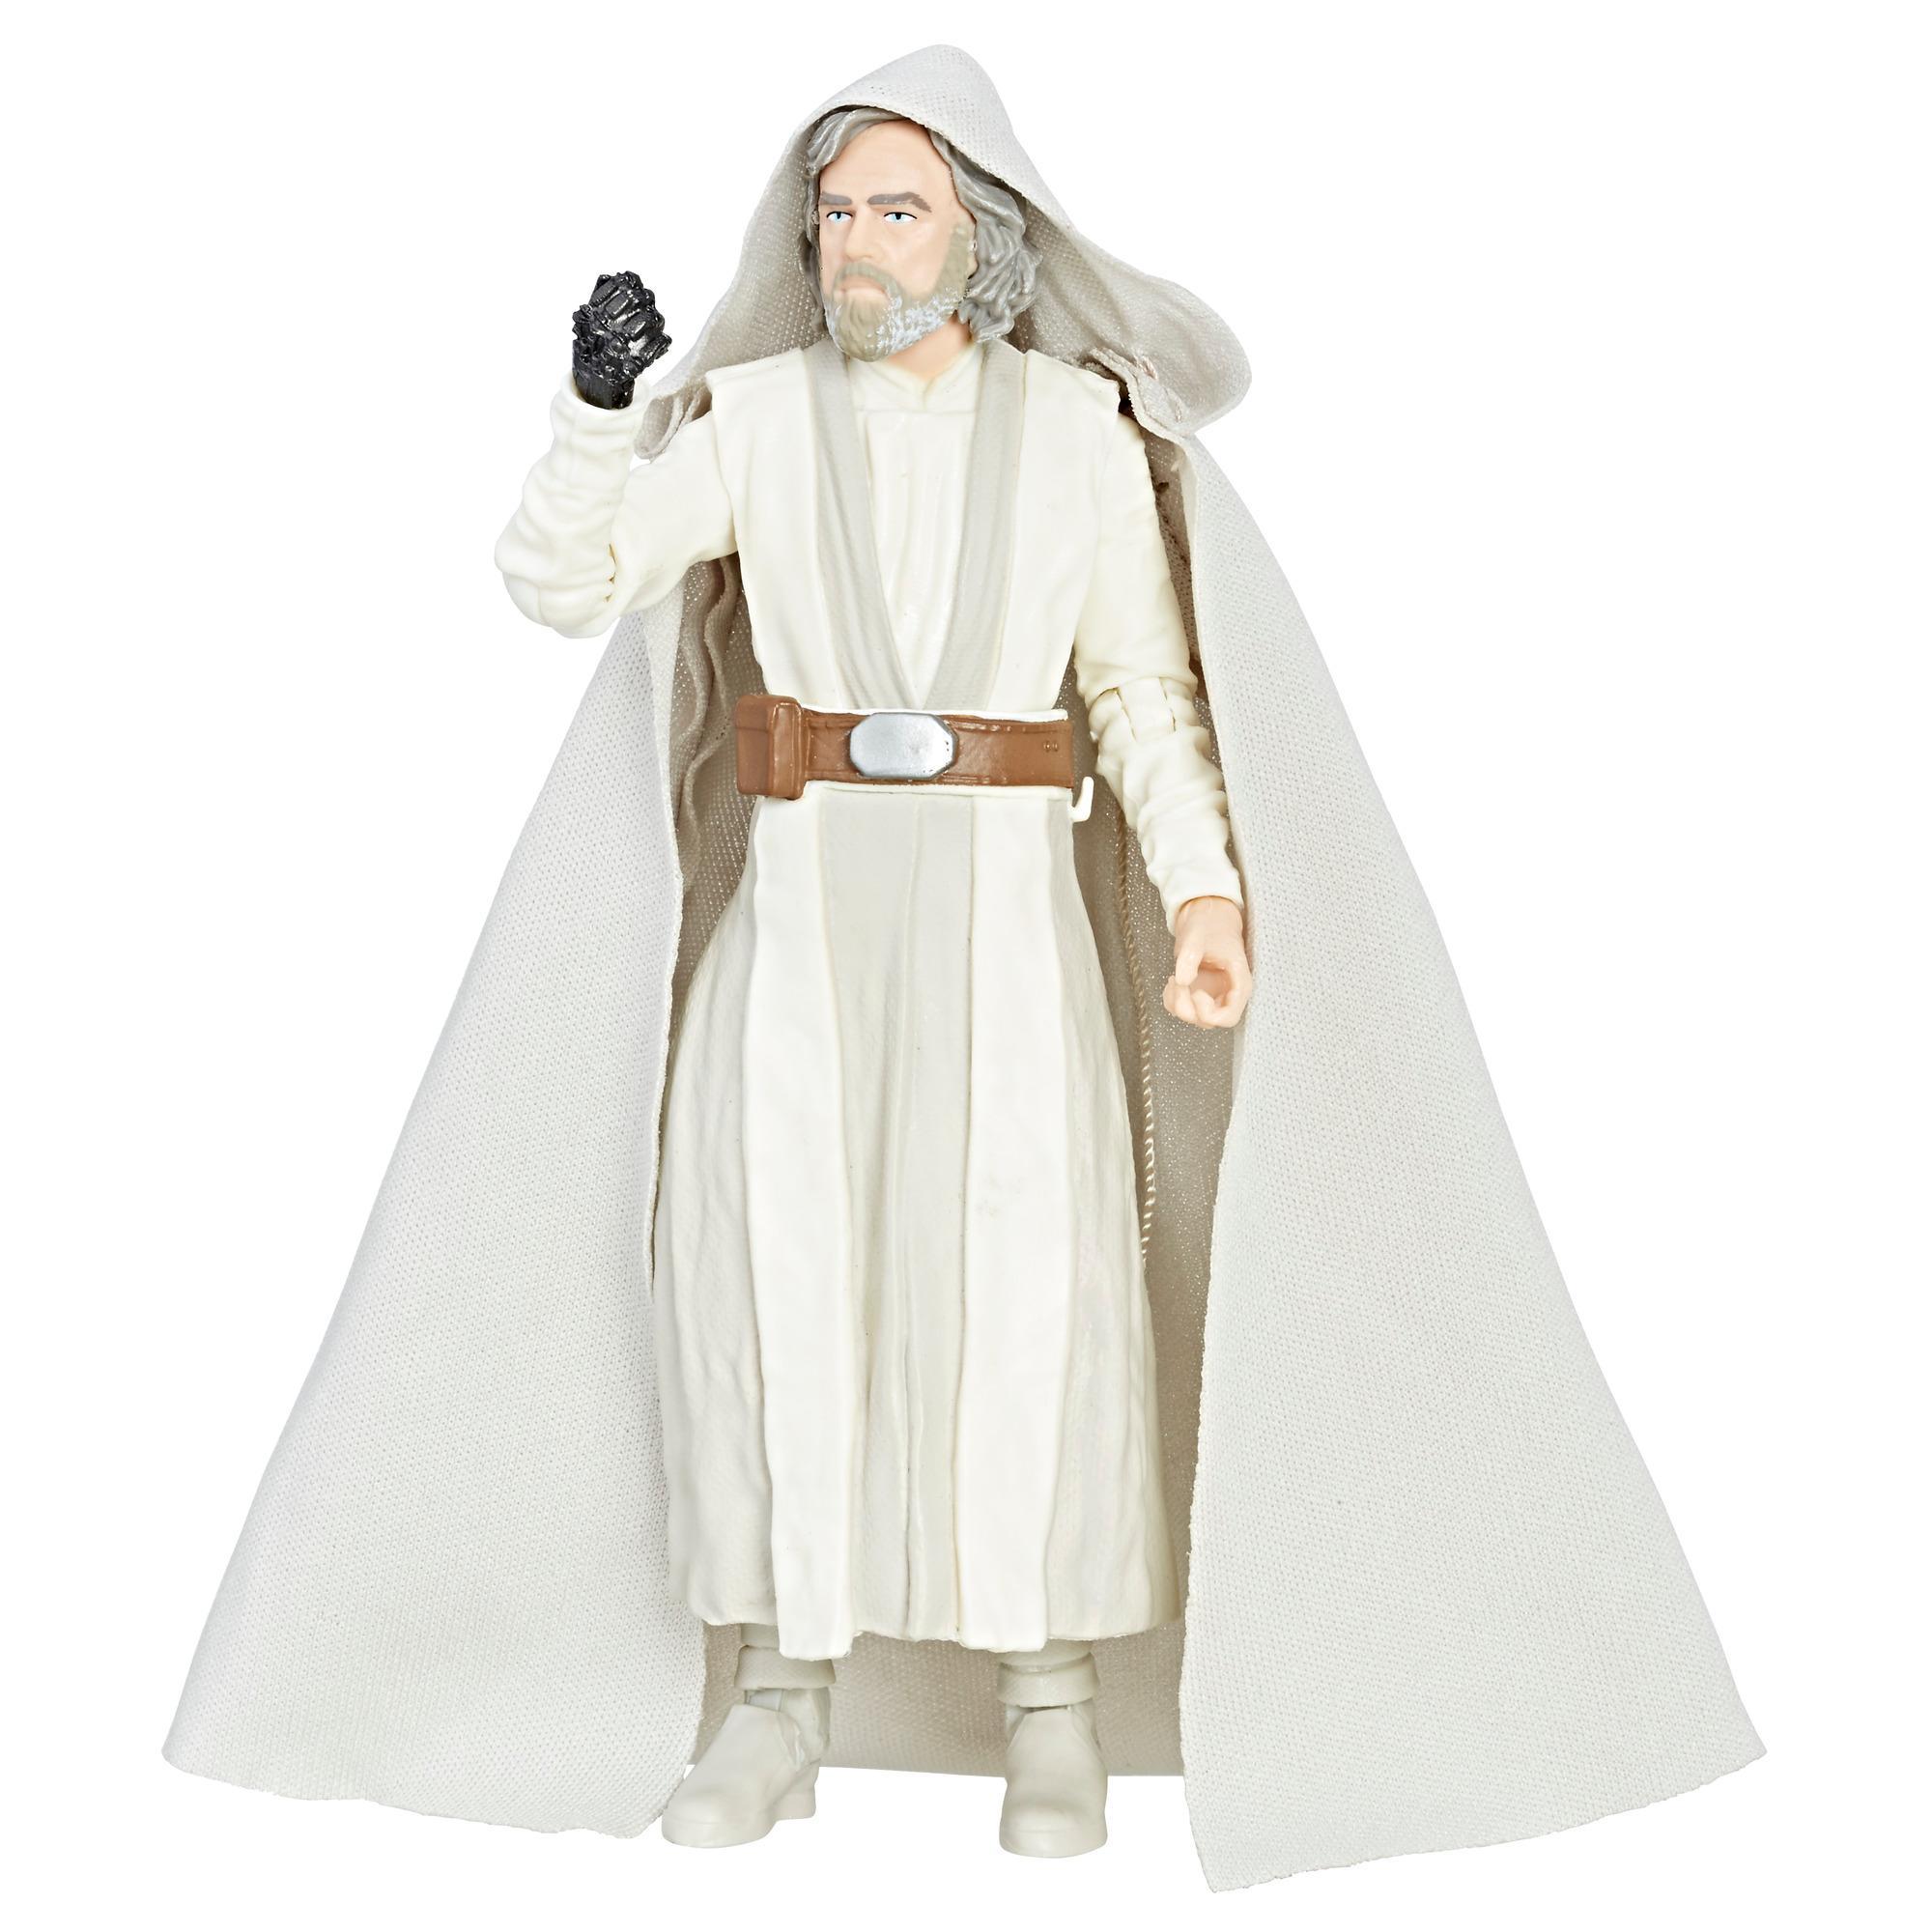 Star Wars The Black Series Luke Skywalker (Jedi Master)